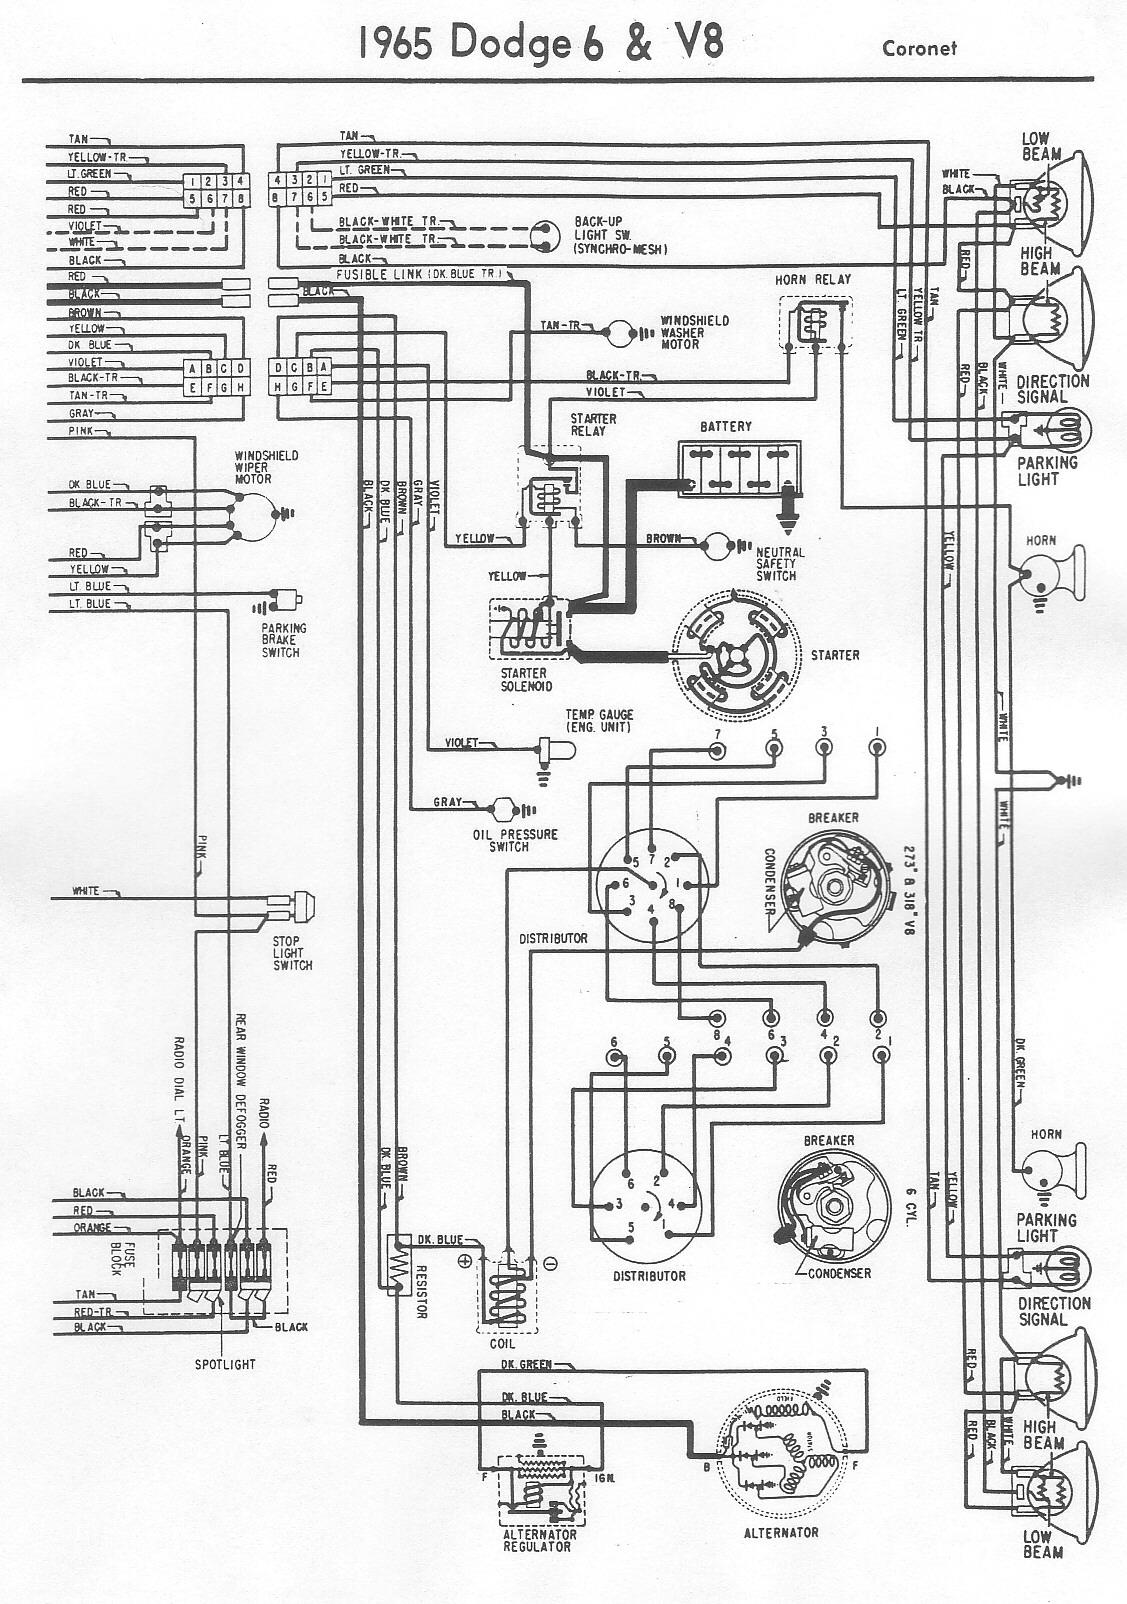 1965 plymouth satellite wiring diagram trusted wiring diagram 1968 coronet wiring diagram 1968 satellite wiring diagram [ 1127 x 1604 Pixel ]